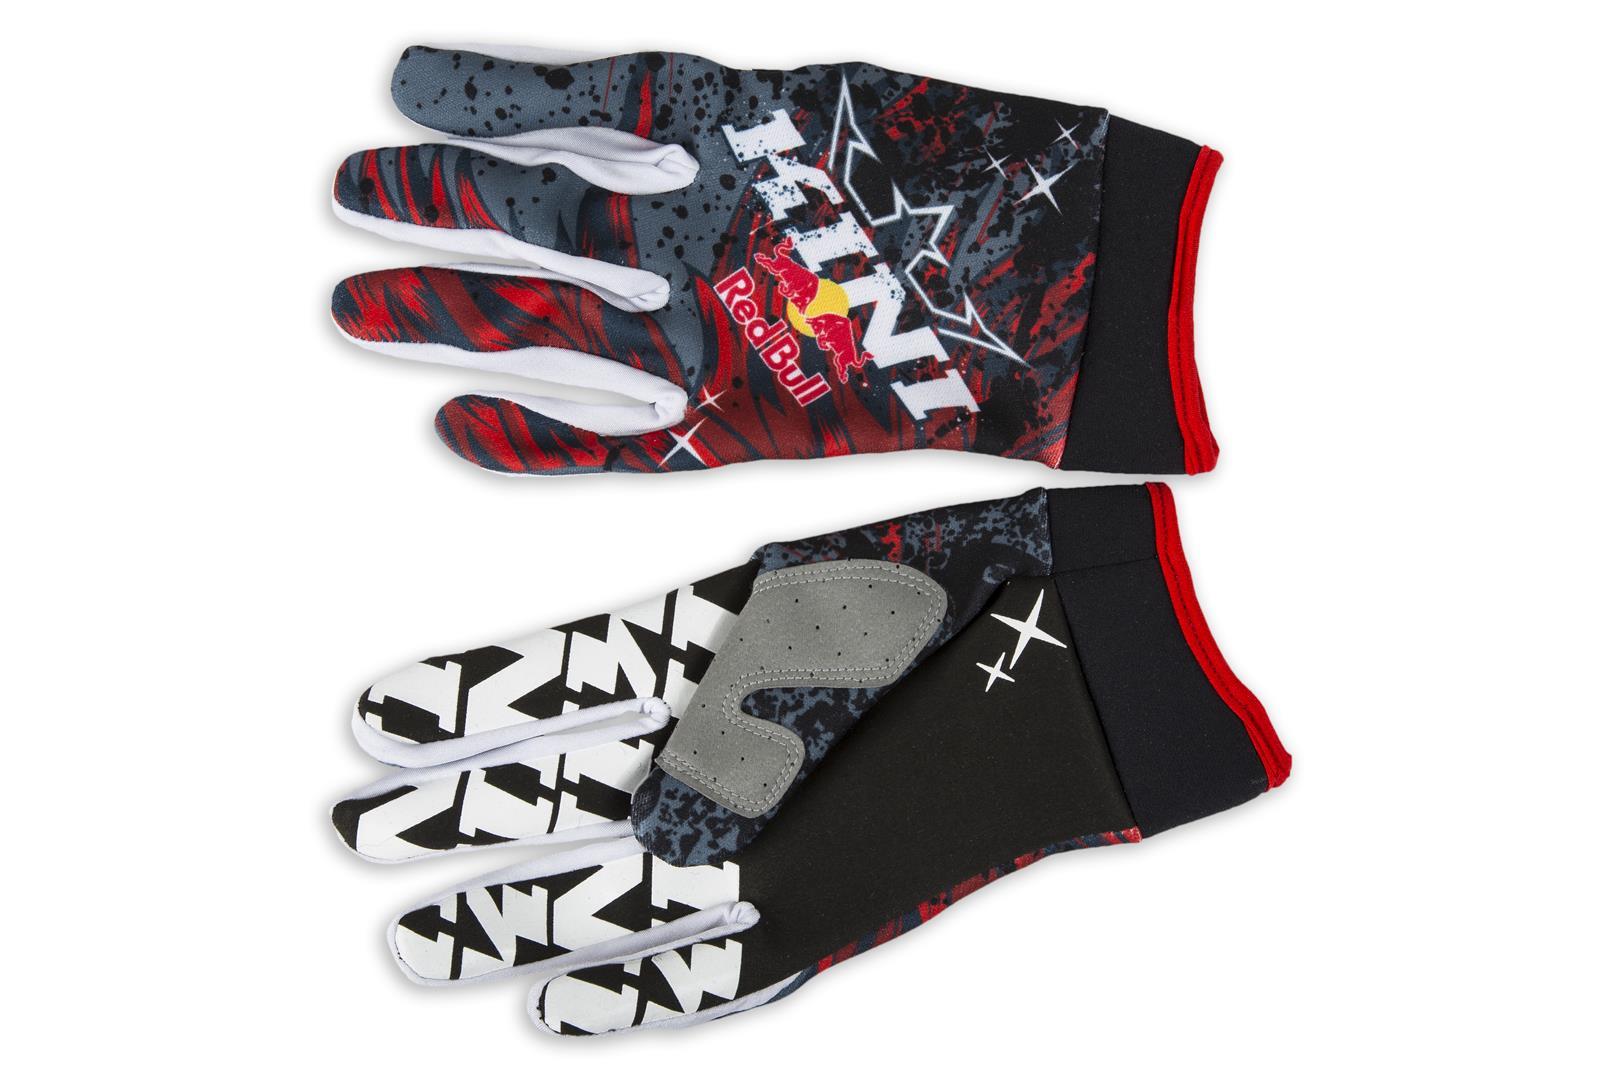 motocross mx handschuhe von kini red bull kini online shop. Black Bedroom Furniture Sets. Home Design Ideas